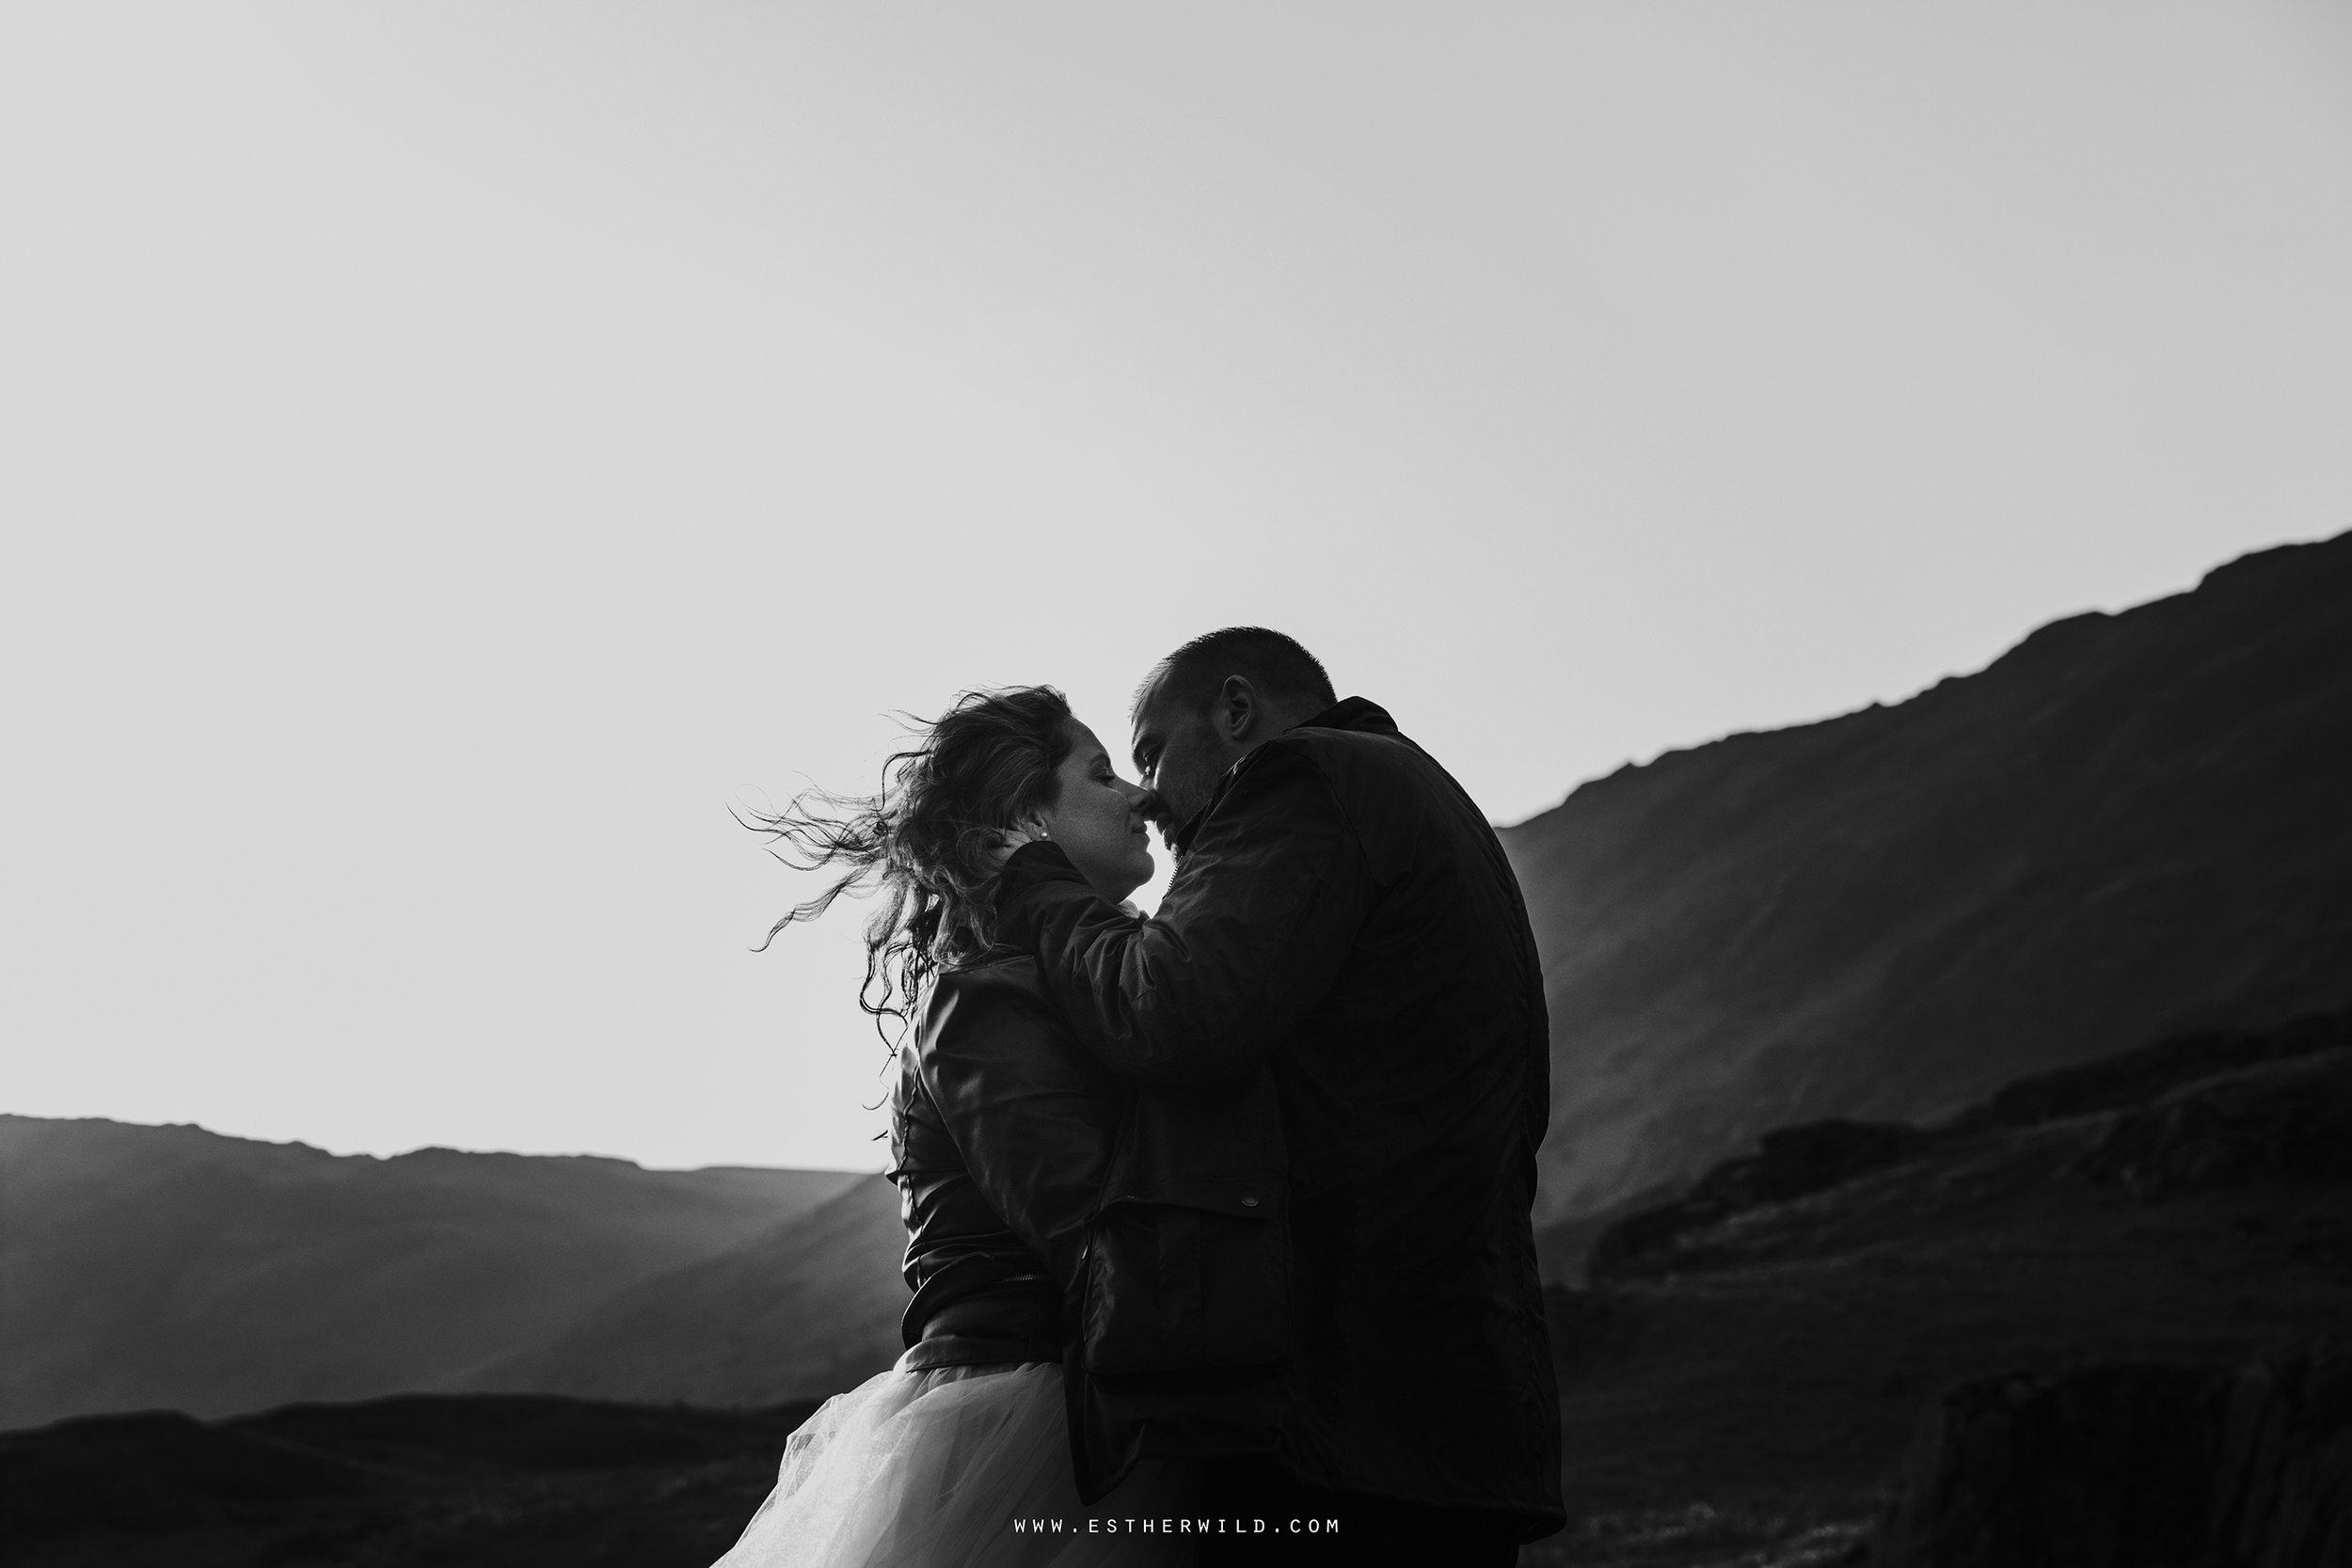 Cumbria_Lake_District_Wasdale_Wedding_Photographer_Destination_Engagement_Anniversary_Esther_Wild_IMG_4504-2.jpg